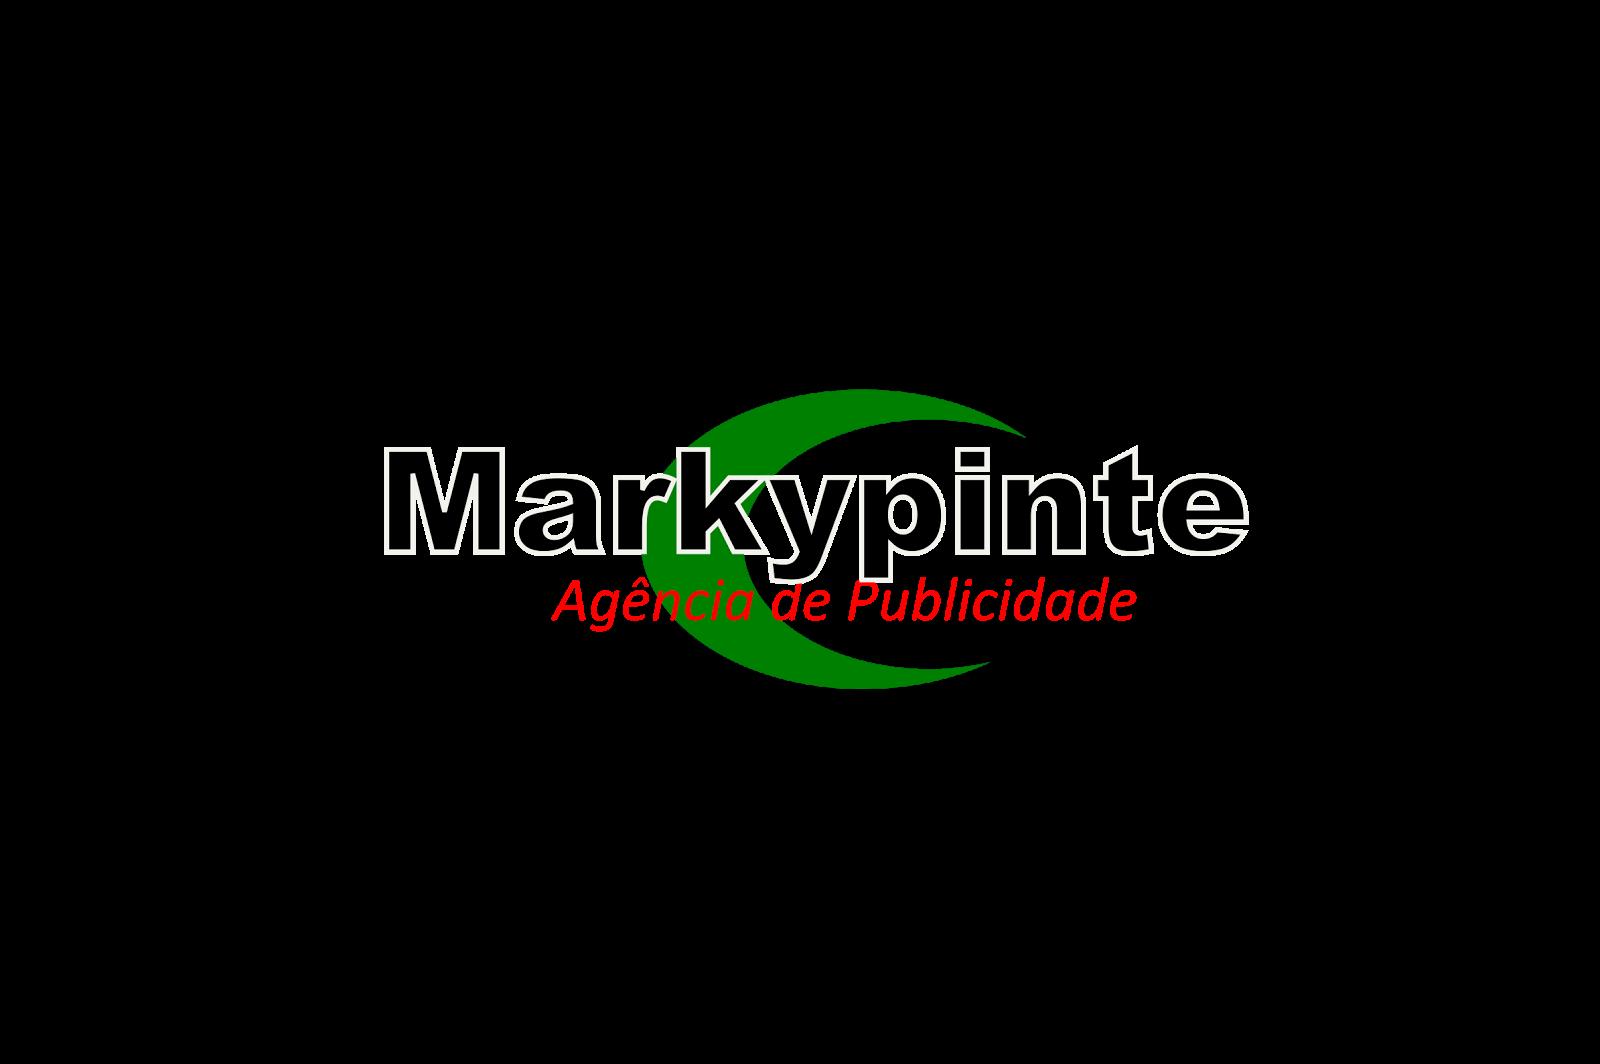 Markypinte